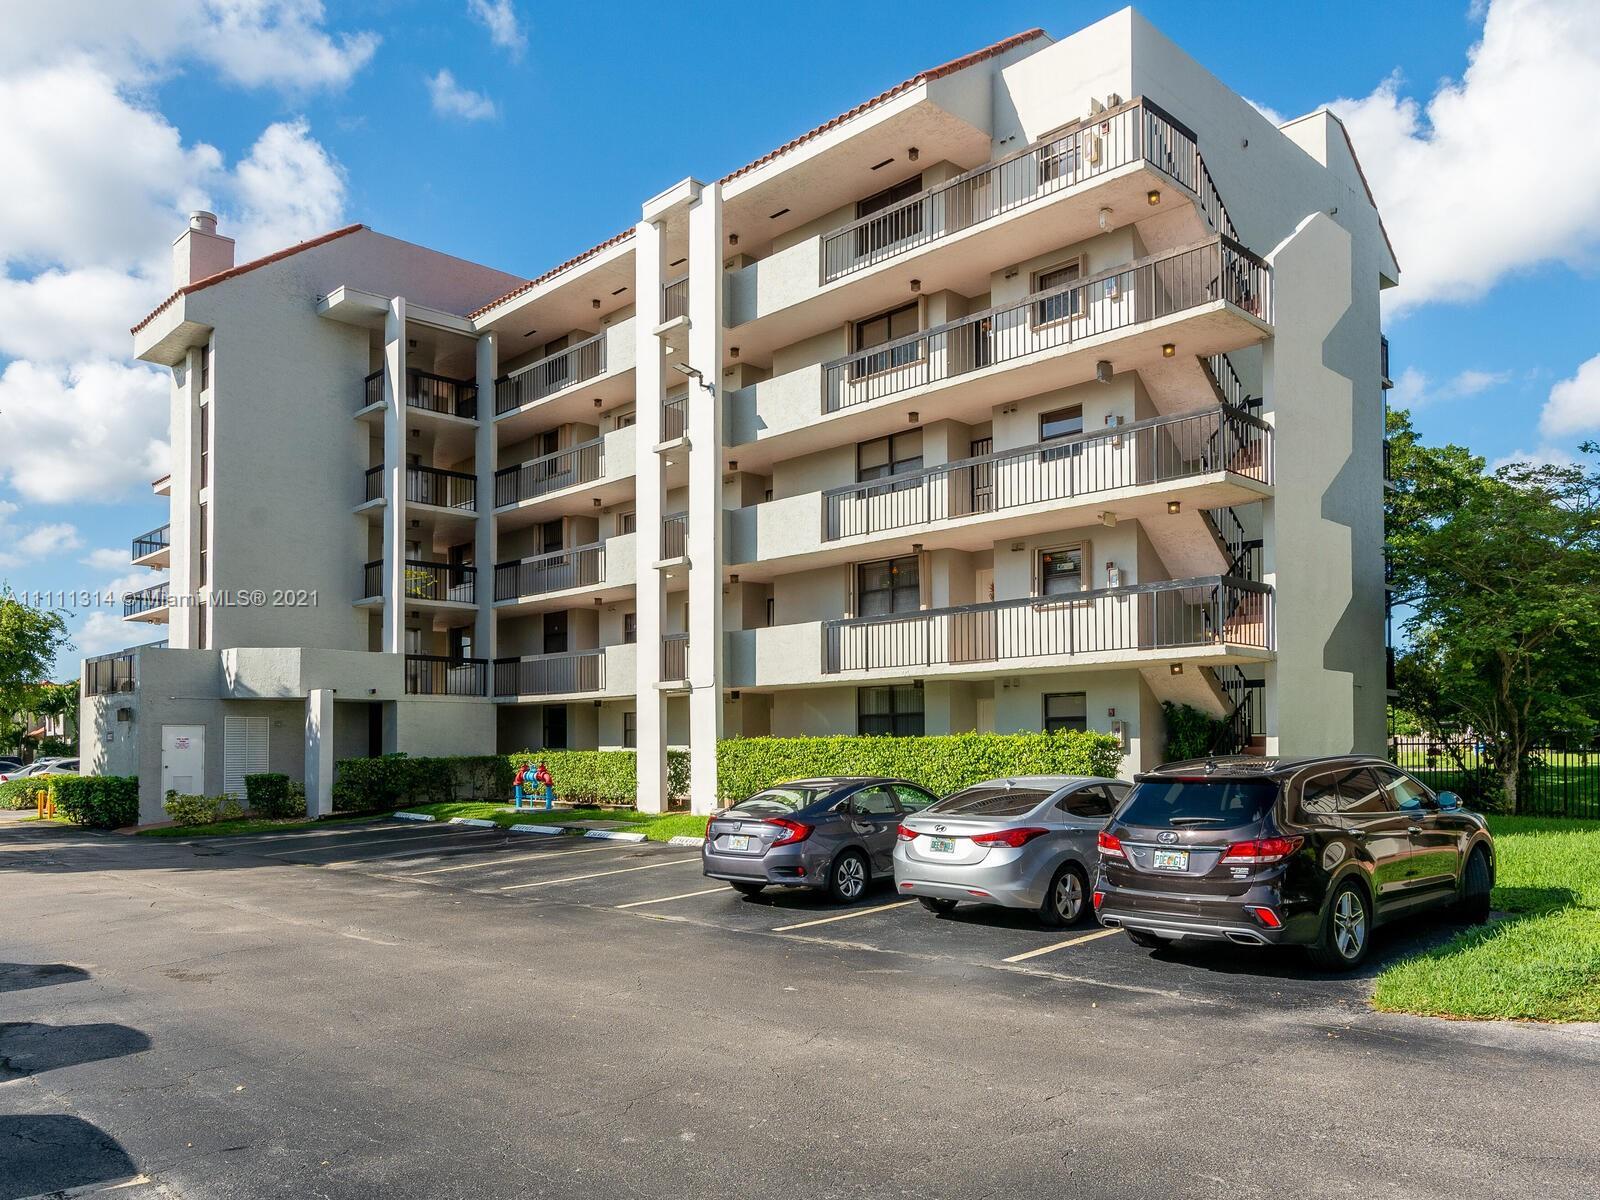 10317 NW 9th Street Cir Unit 1059, Miami FL 33172